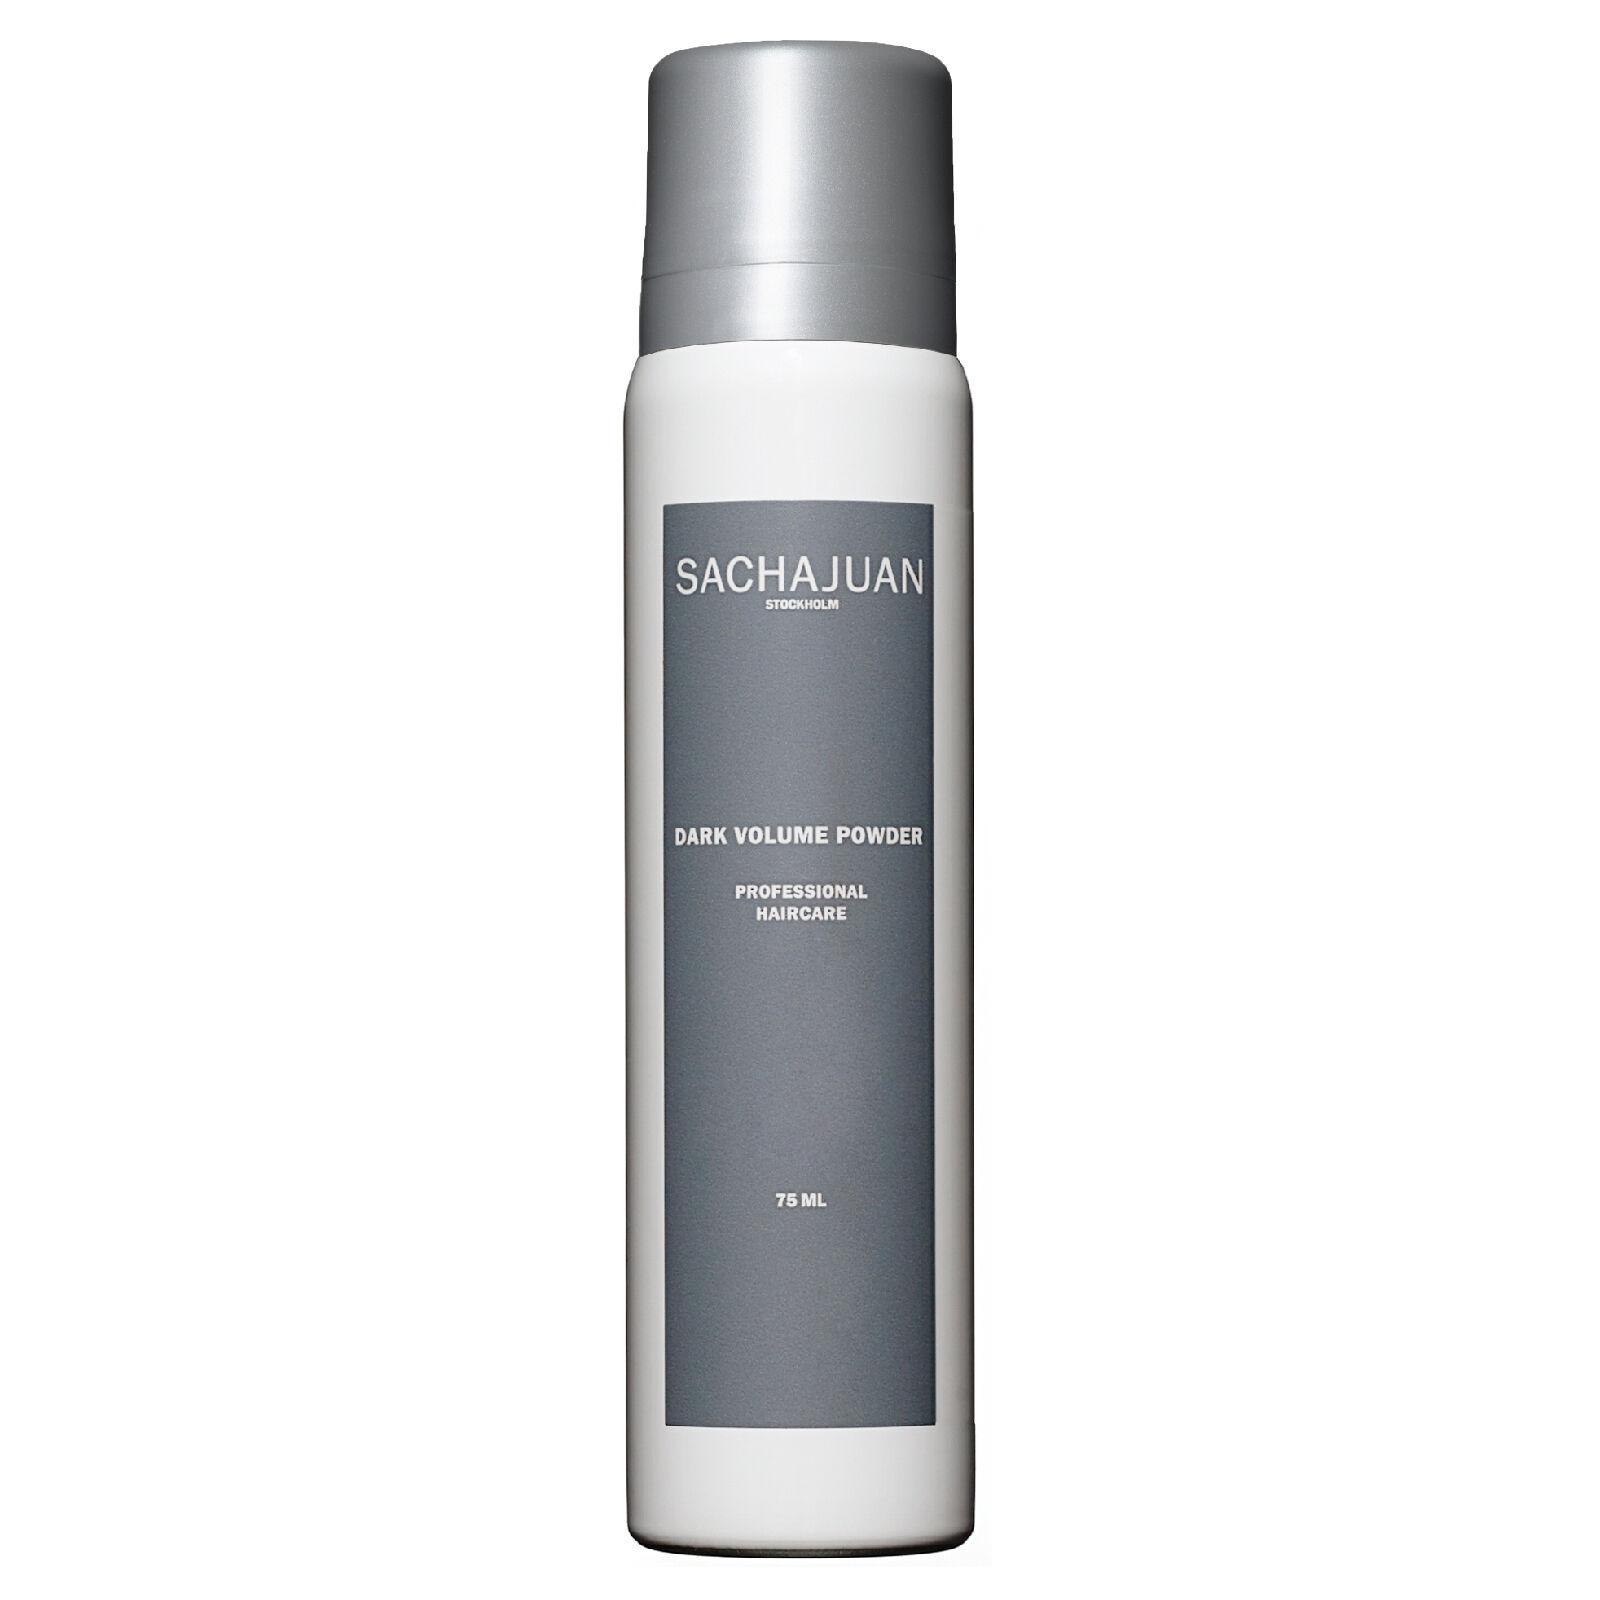 Sachajuan Shampooing sec Volumateur Cheveux Foncés « Dark Volume Powder » Sachajuan Format voyage 75 ml